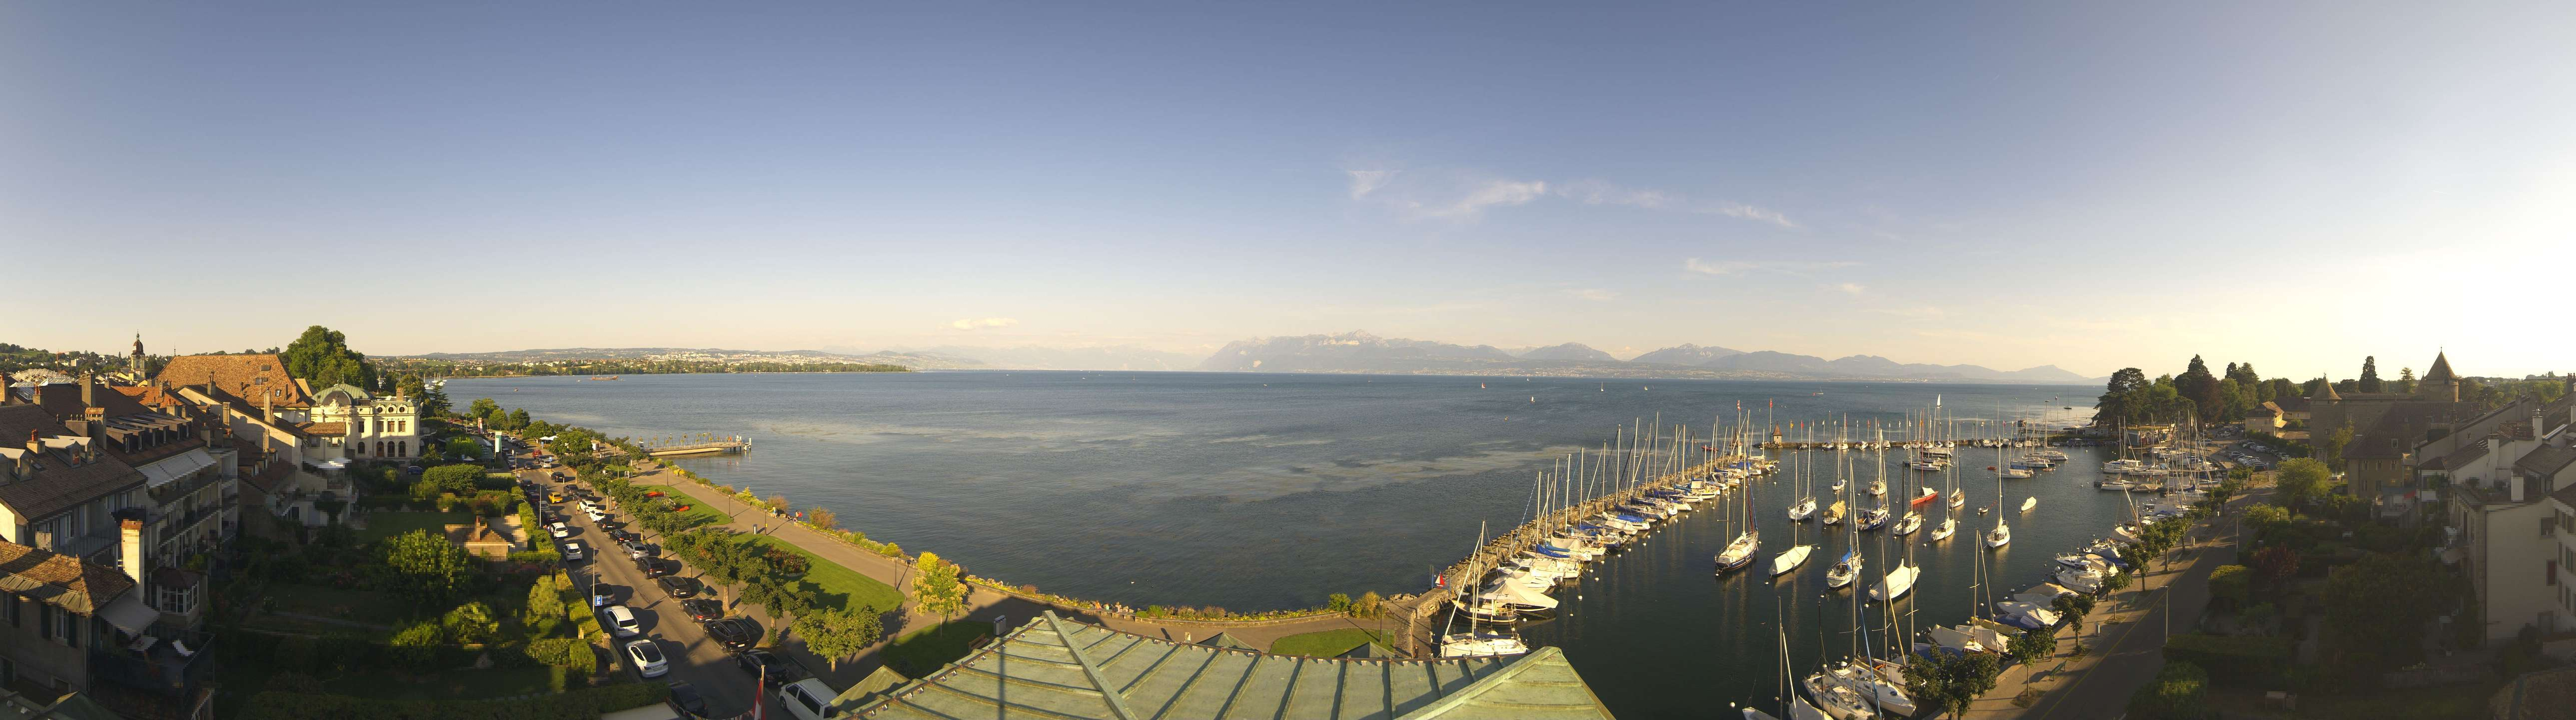 Webcam Morges Port